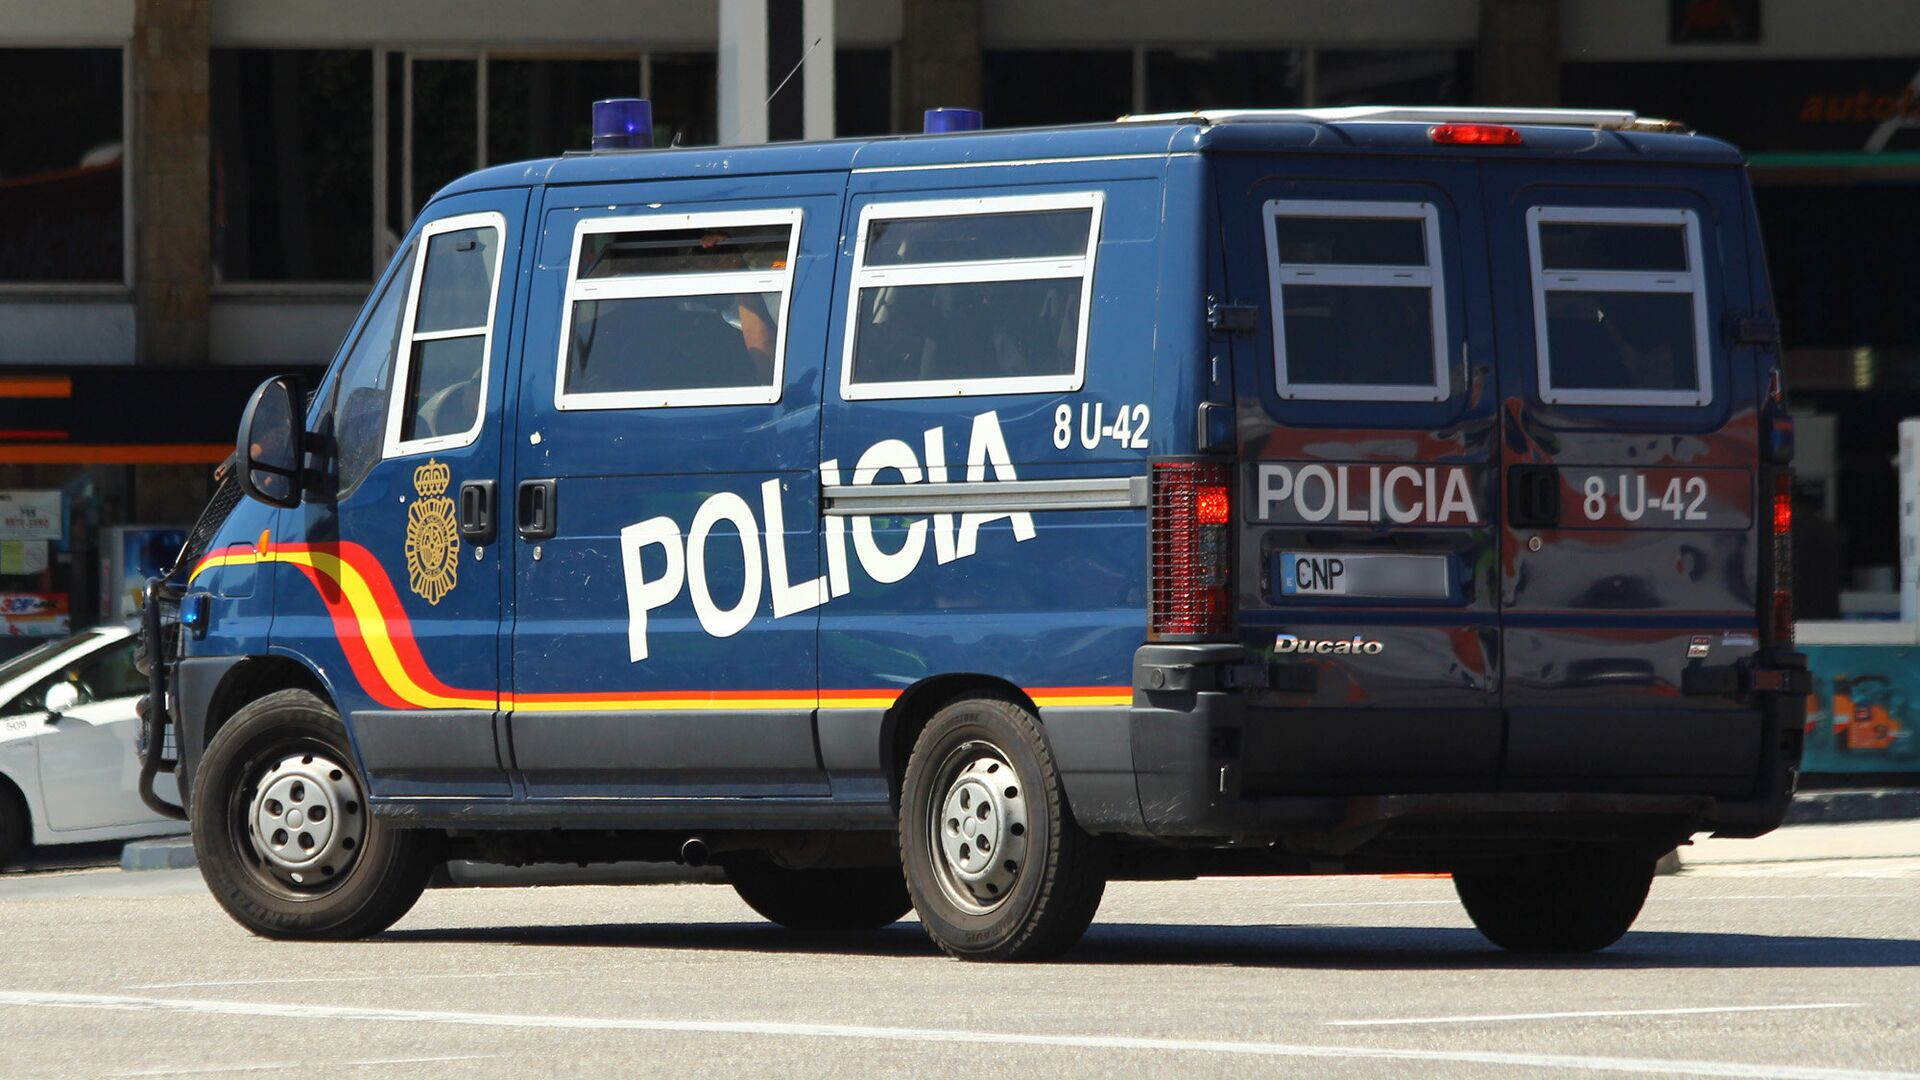 Policía Nacional de España (archivo) - Sputnik Mundo, 1920, 15.09.2021